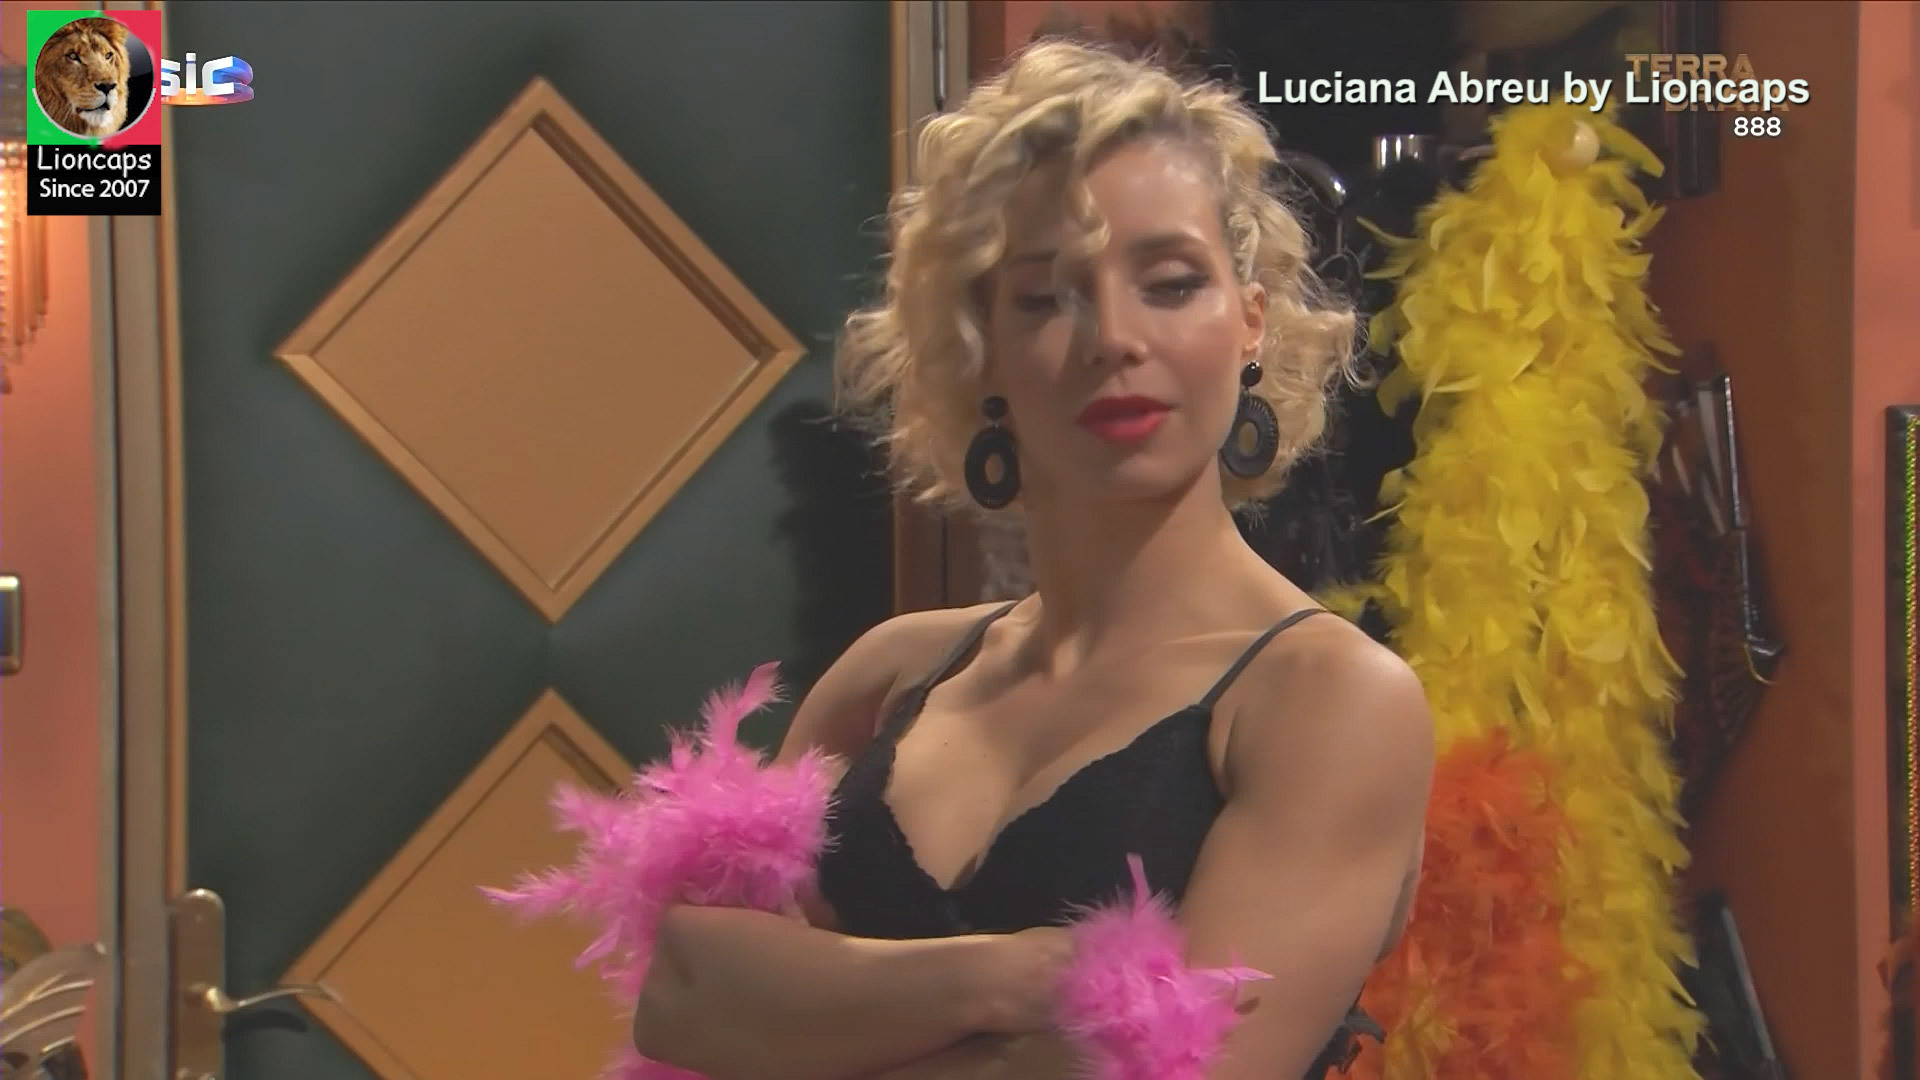 luciana_abreu_terra_brava_lioncaps_30_11_2020 (14).jpg